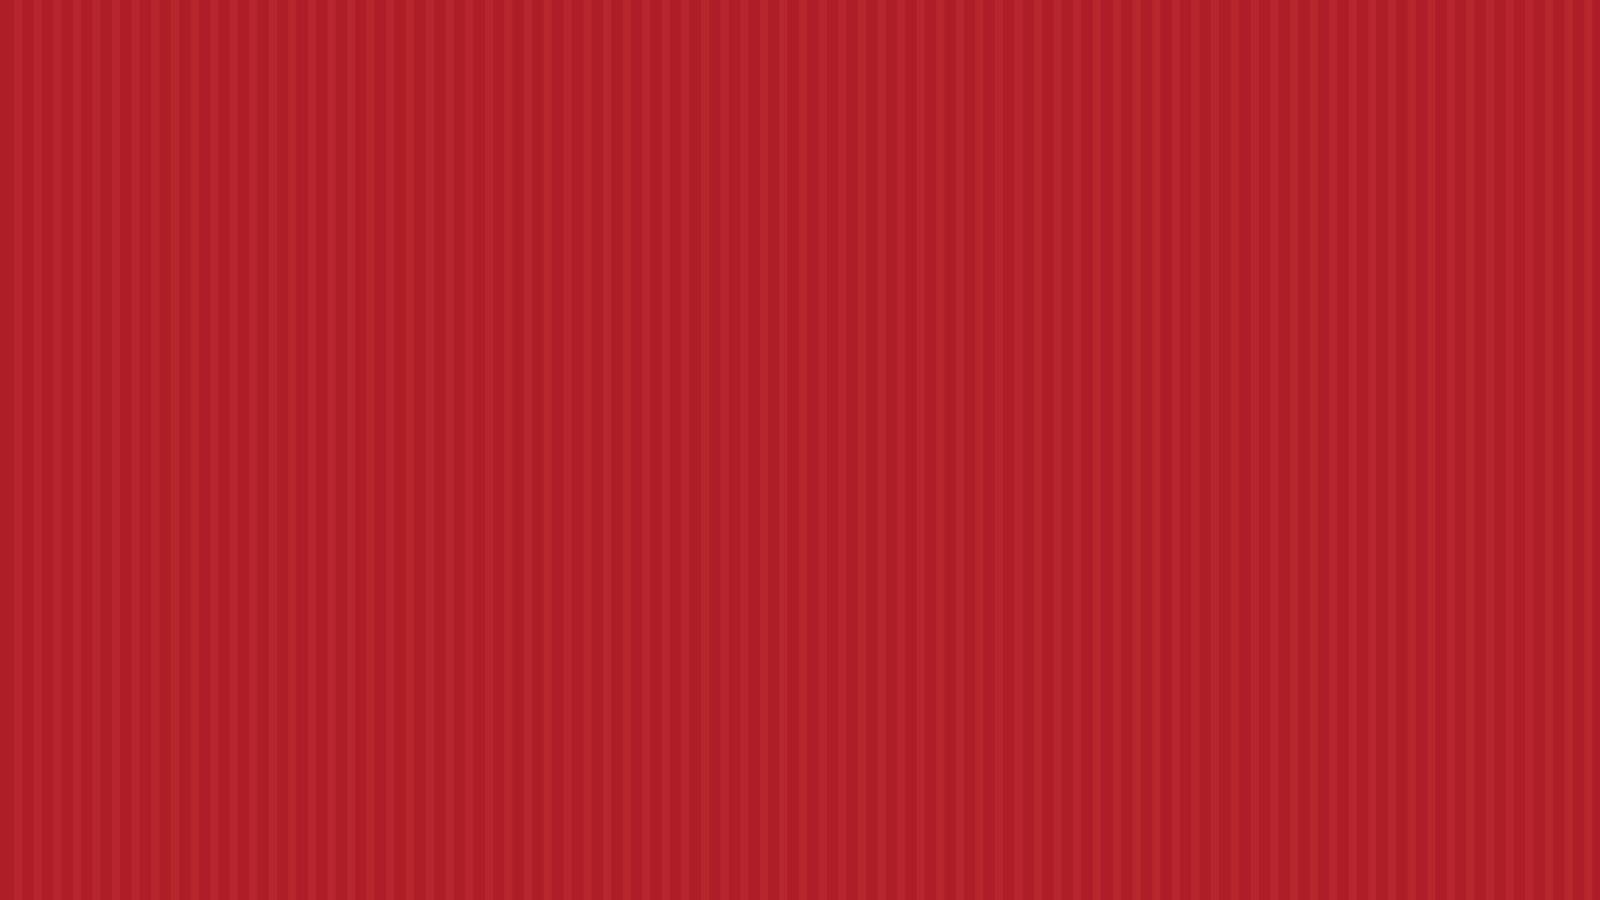 light red wallpaper 5121 - photo #16